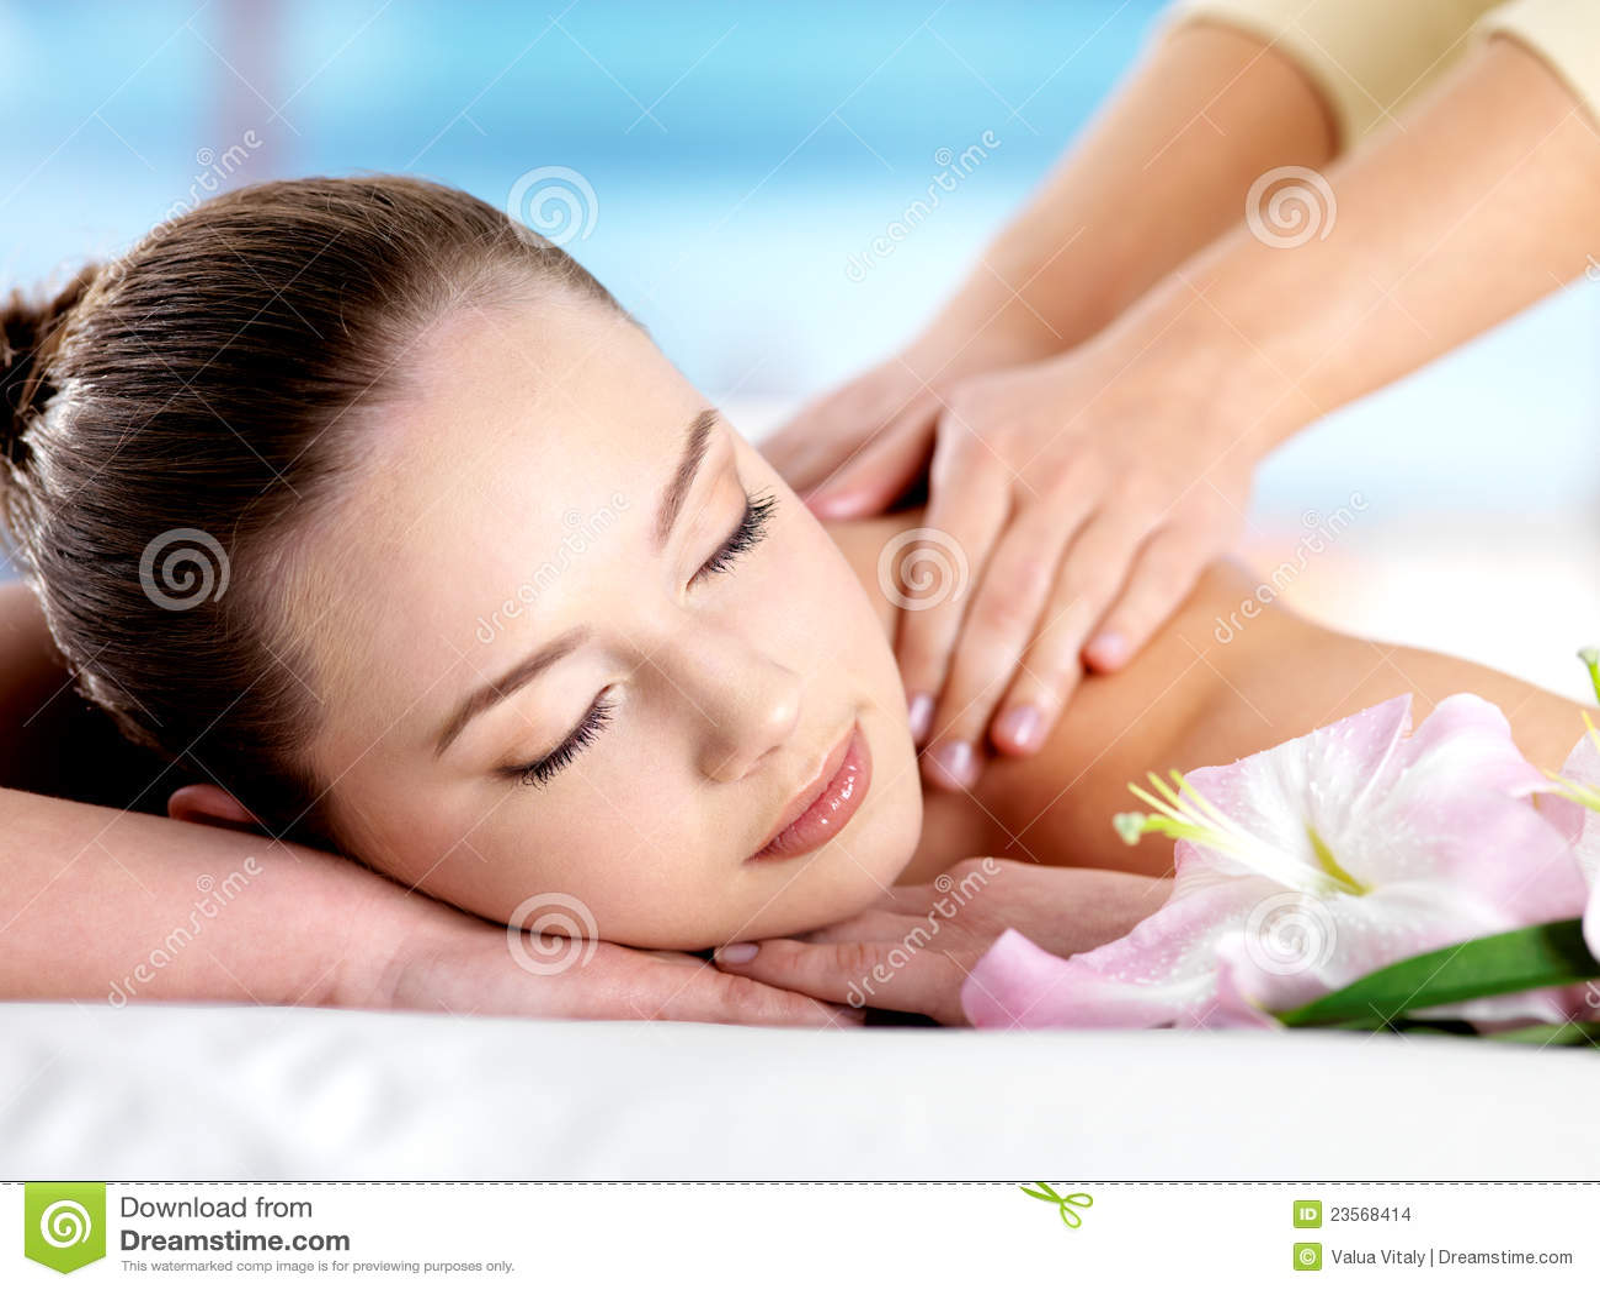 sql date body to body massage